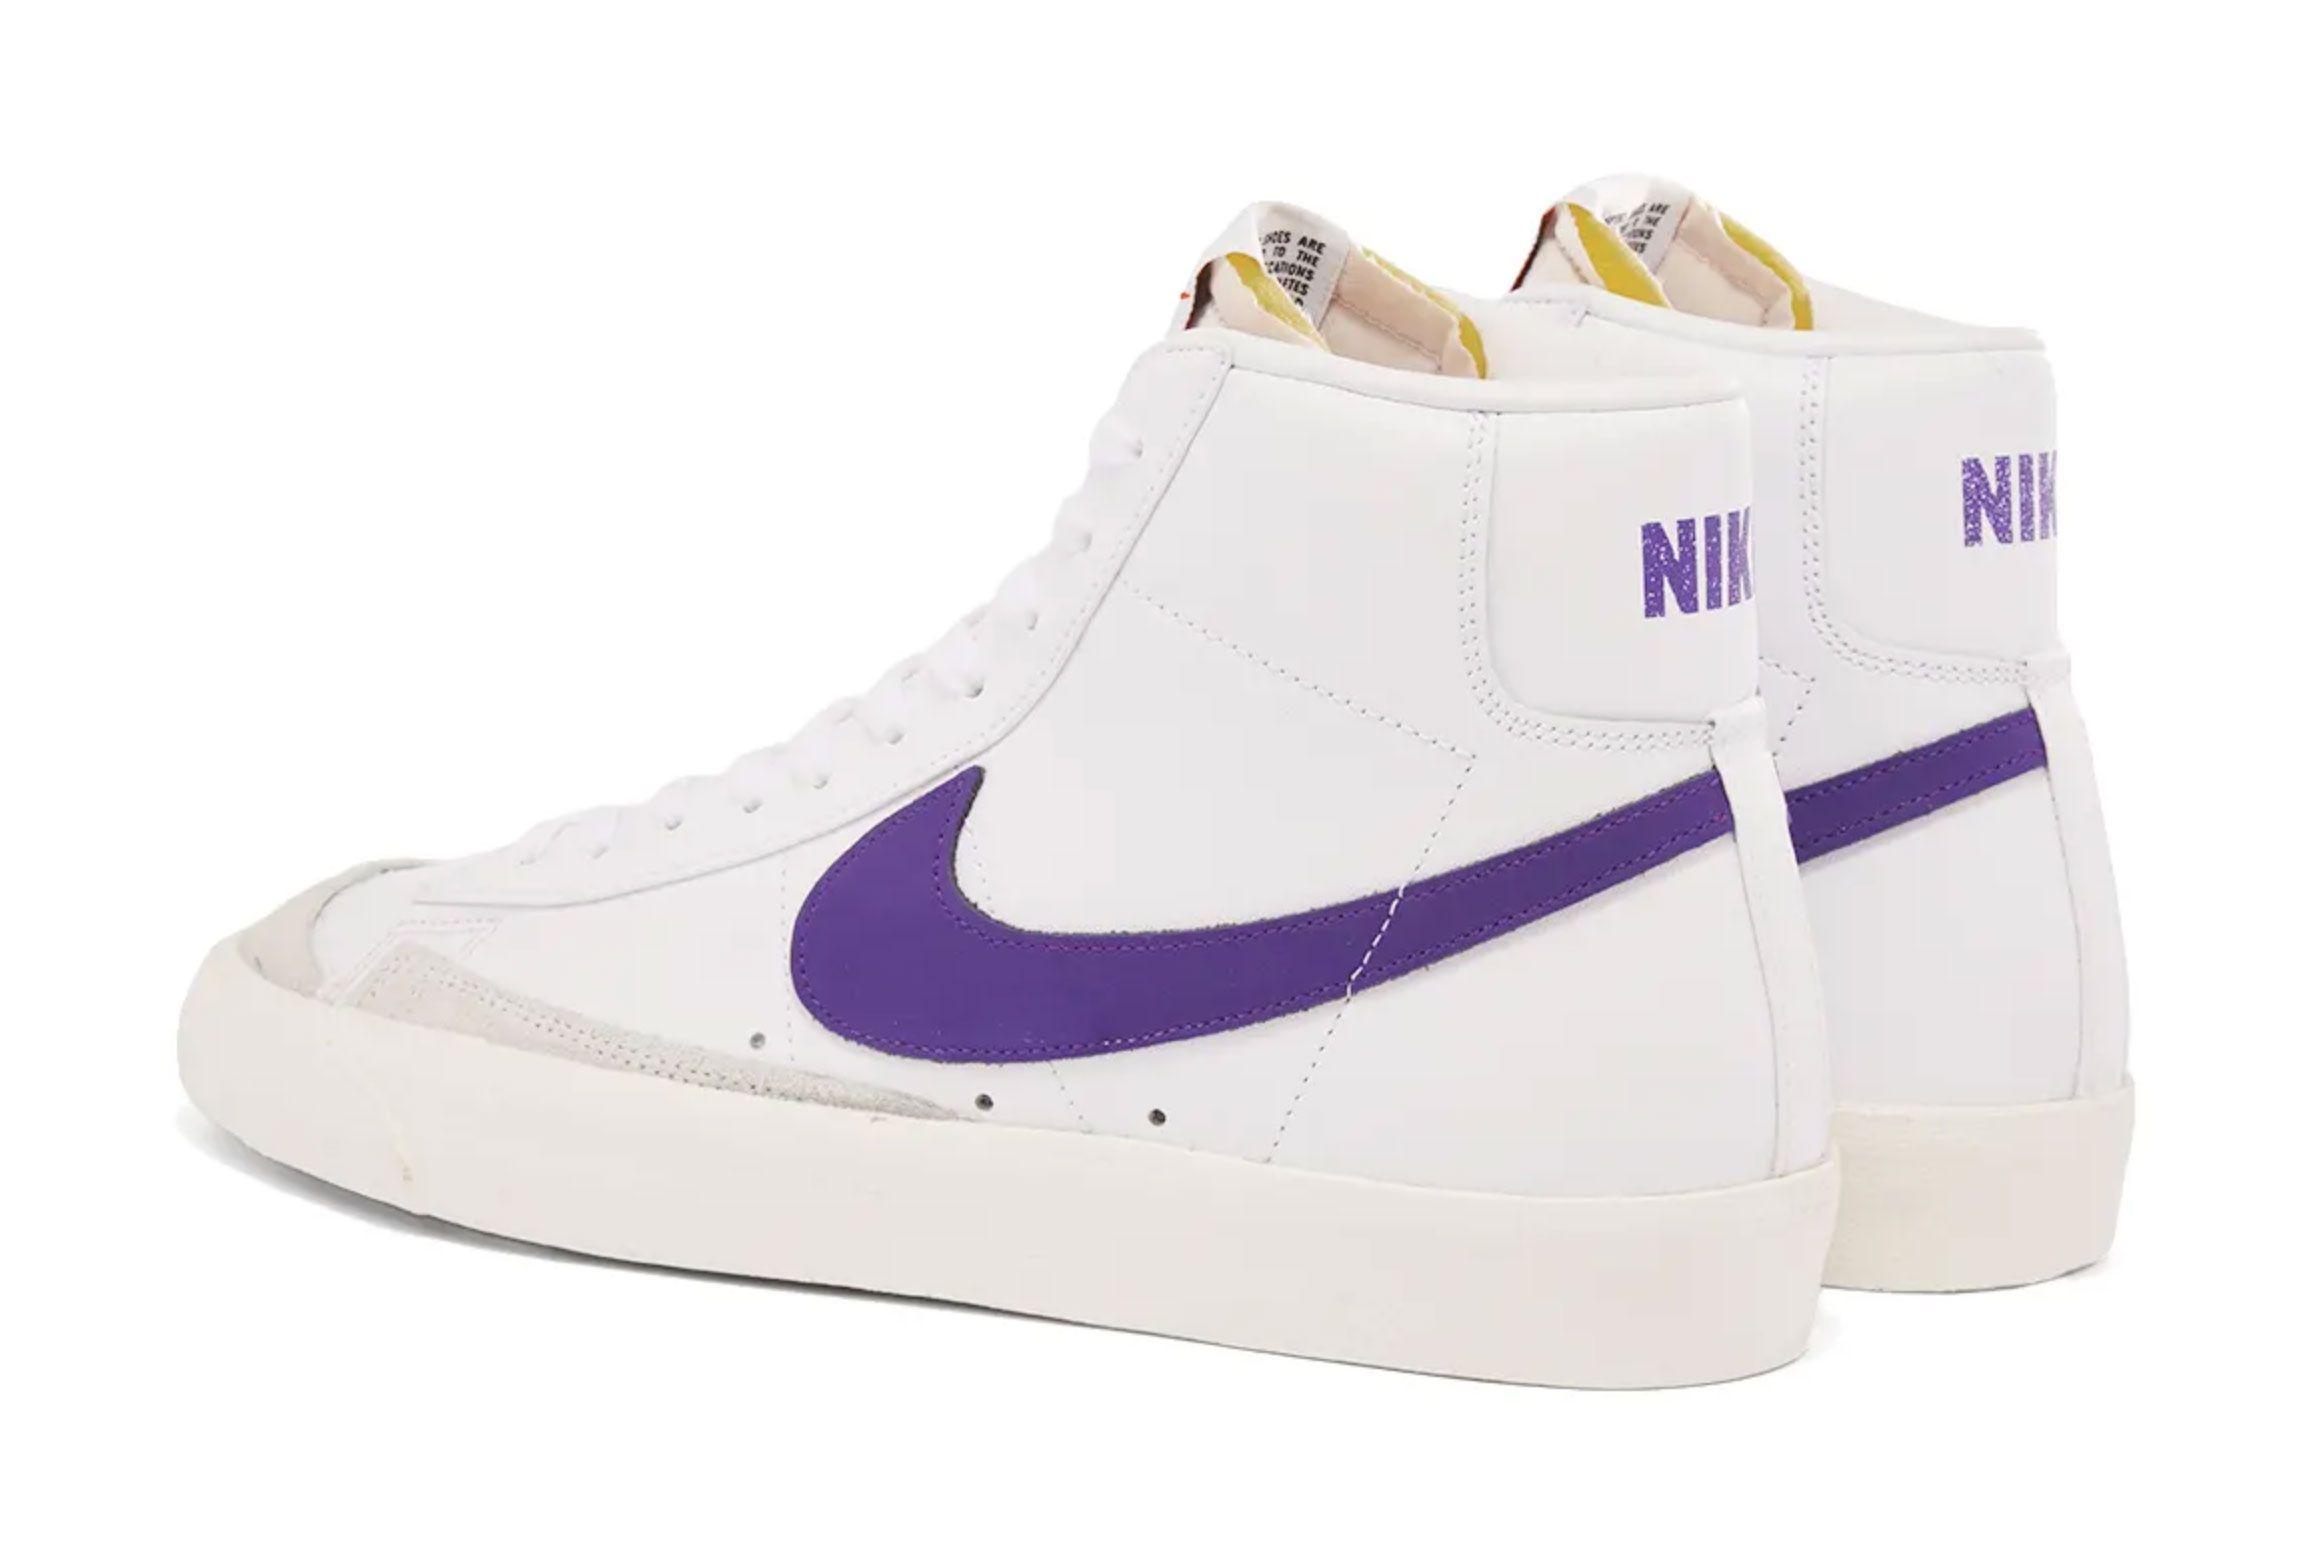 Nike Blazer Mid 77 (Voltage Purple)